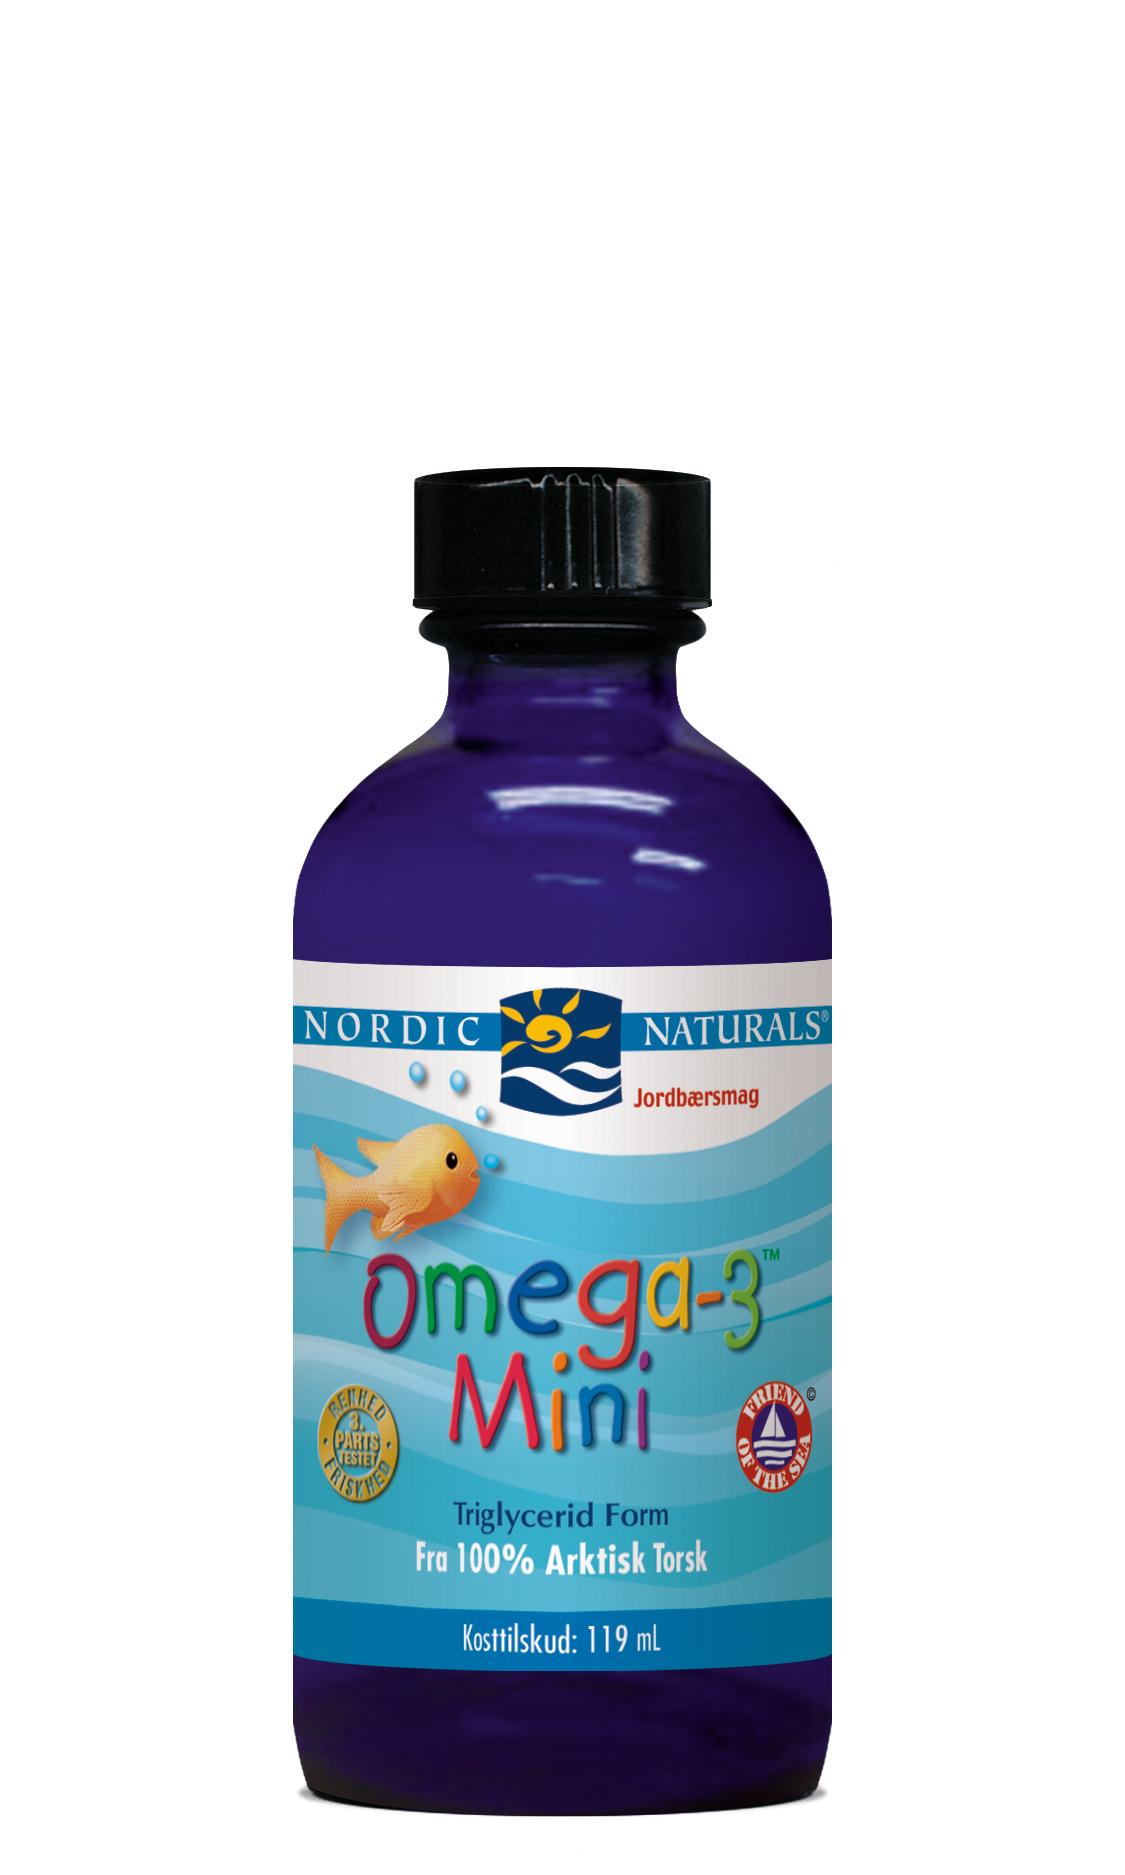 Omega-3 mini (119 ml)